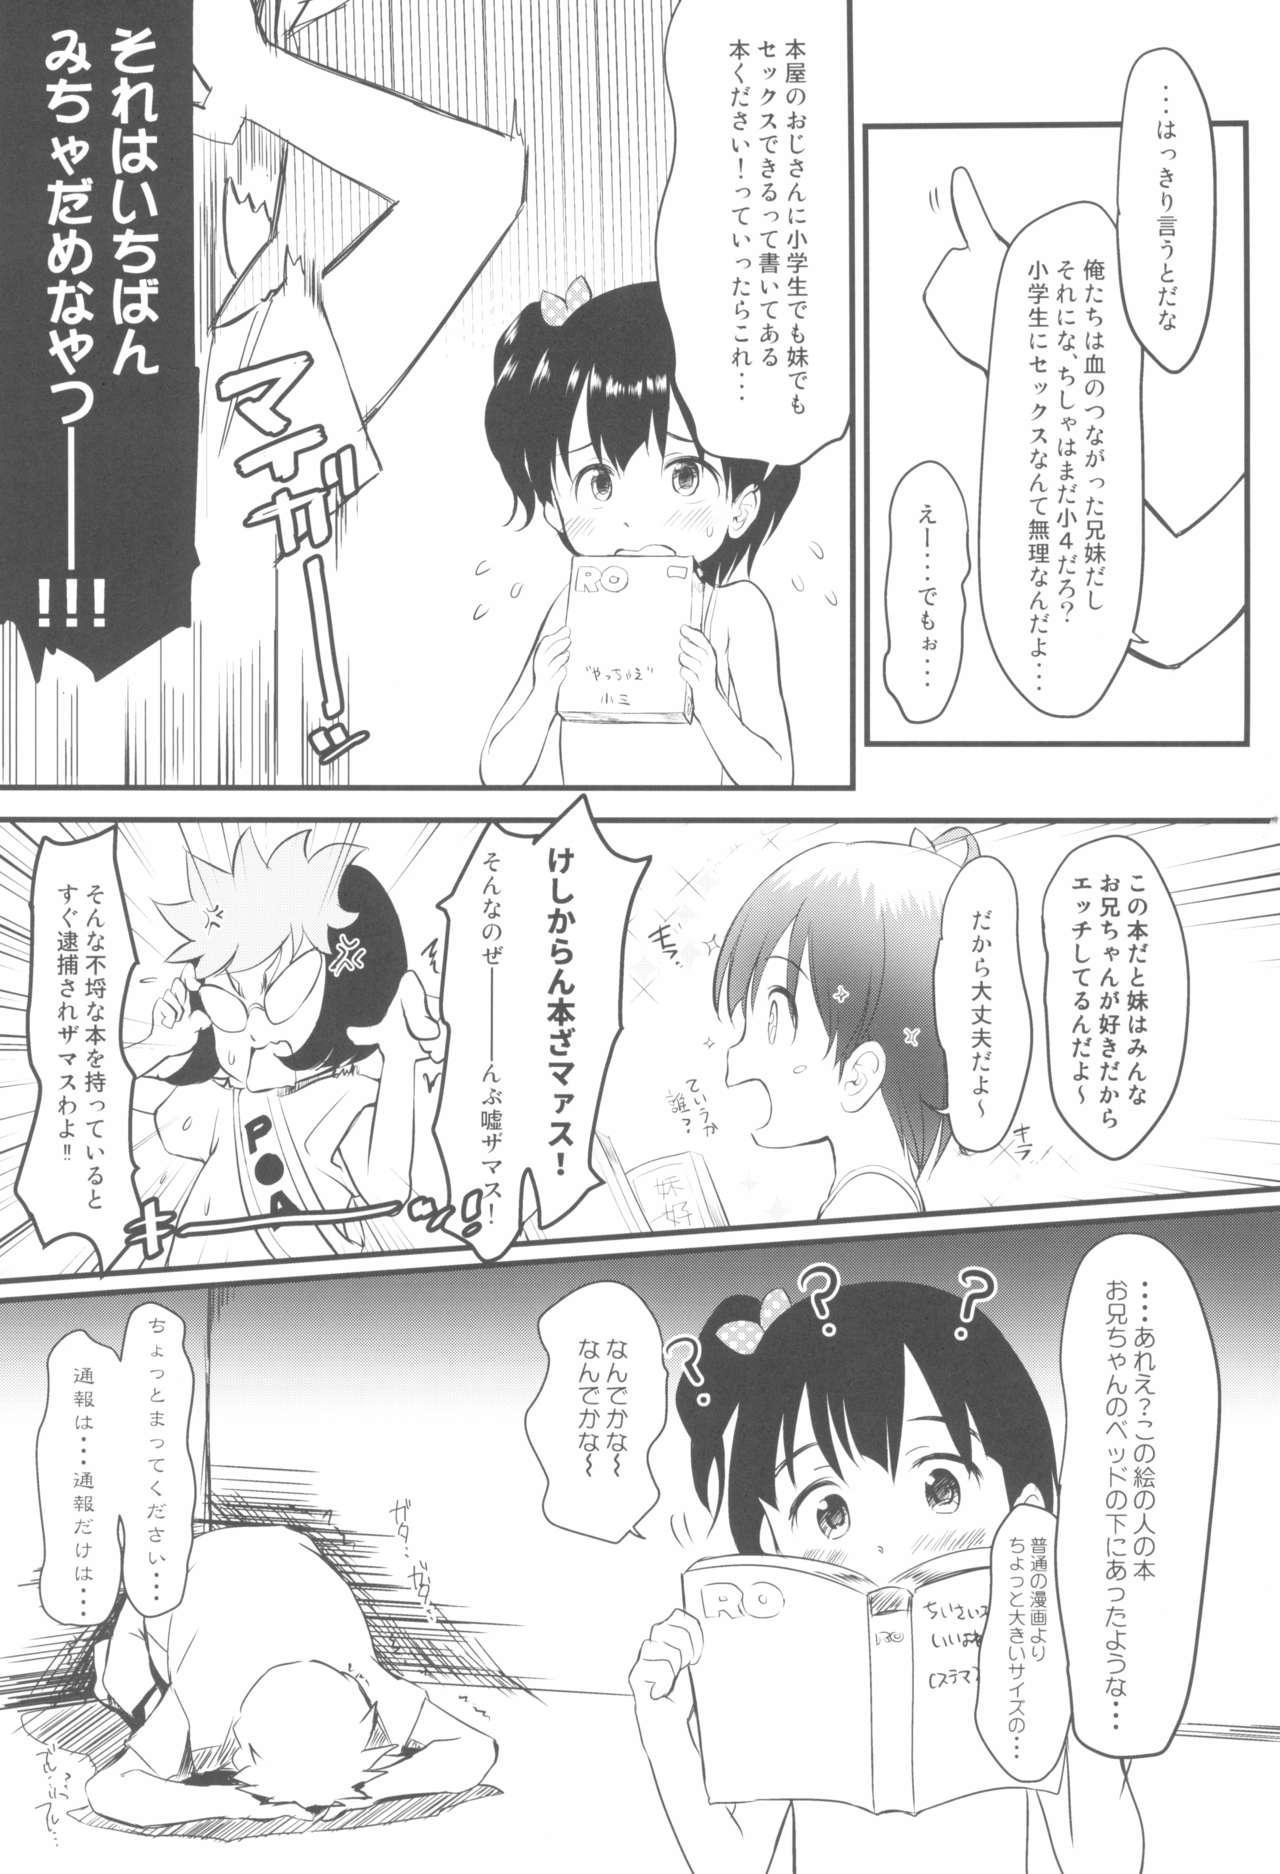 (C97) [Wancho-ke (Wancho)] Imouto wa Minna Onii-chan ga Suki! 5-Kaiteiban- 12